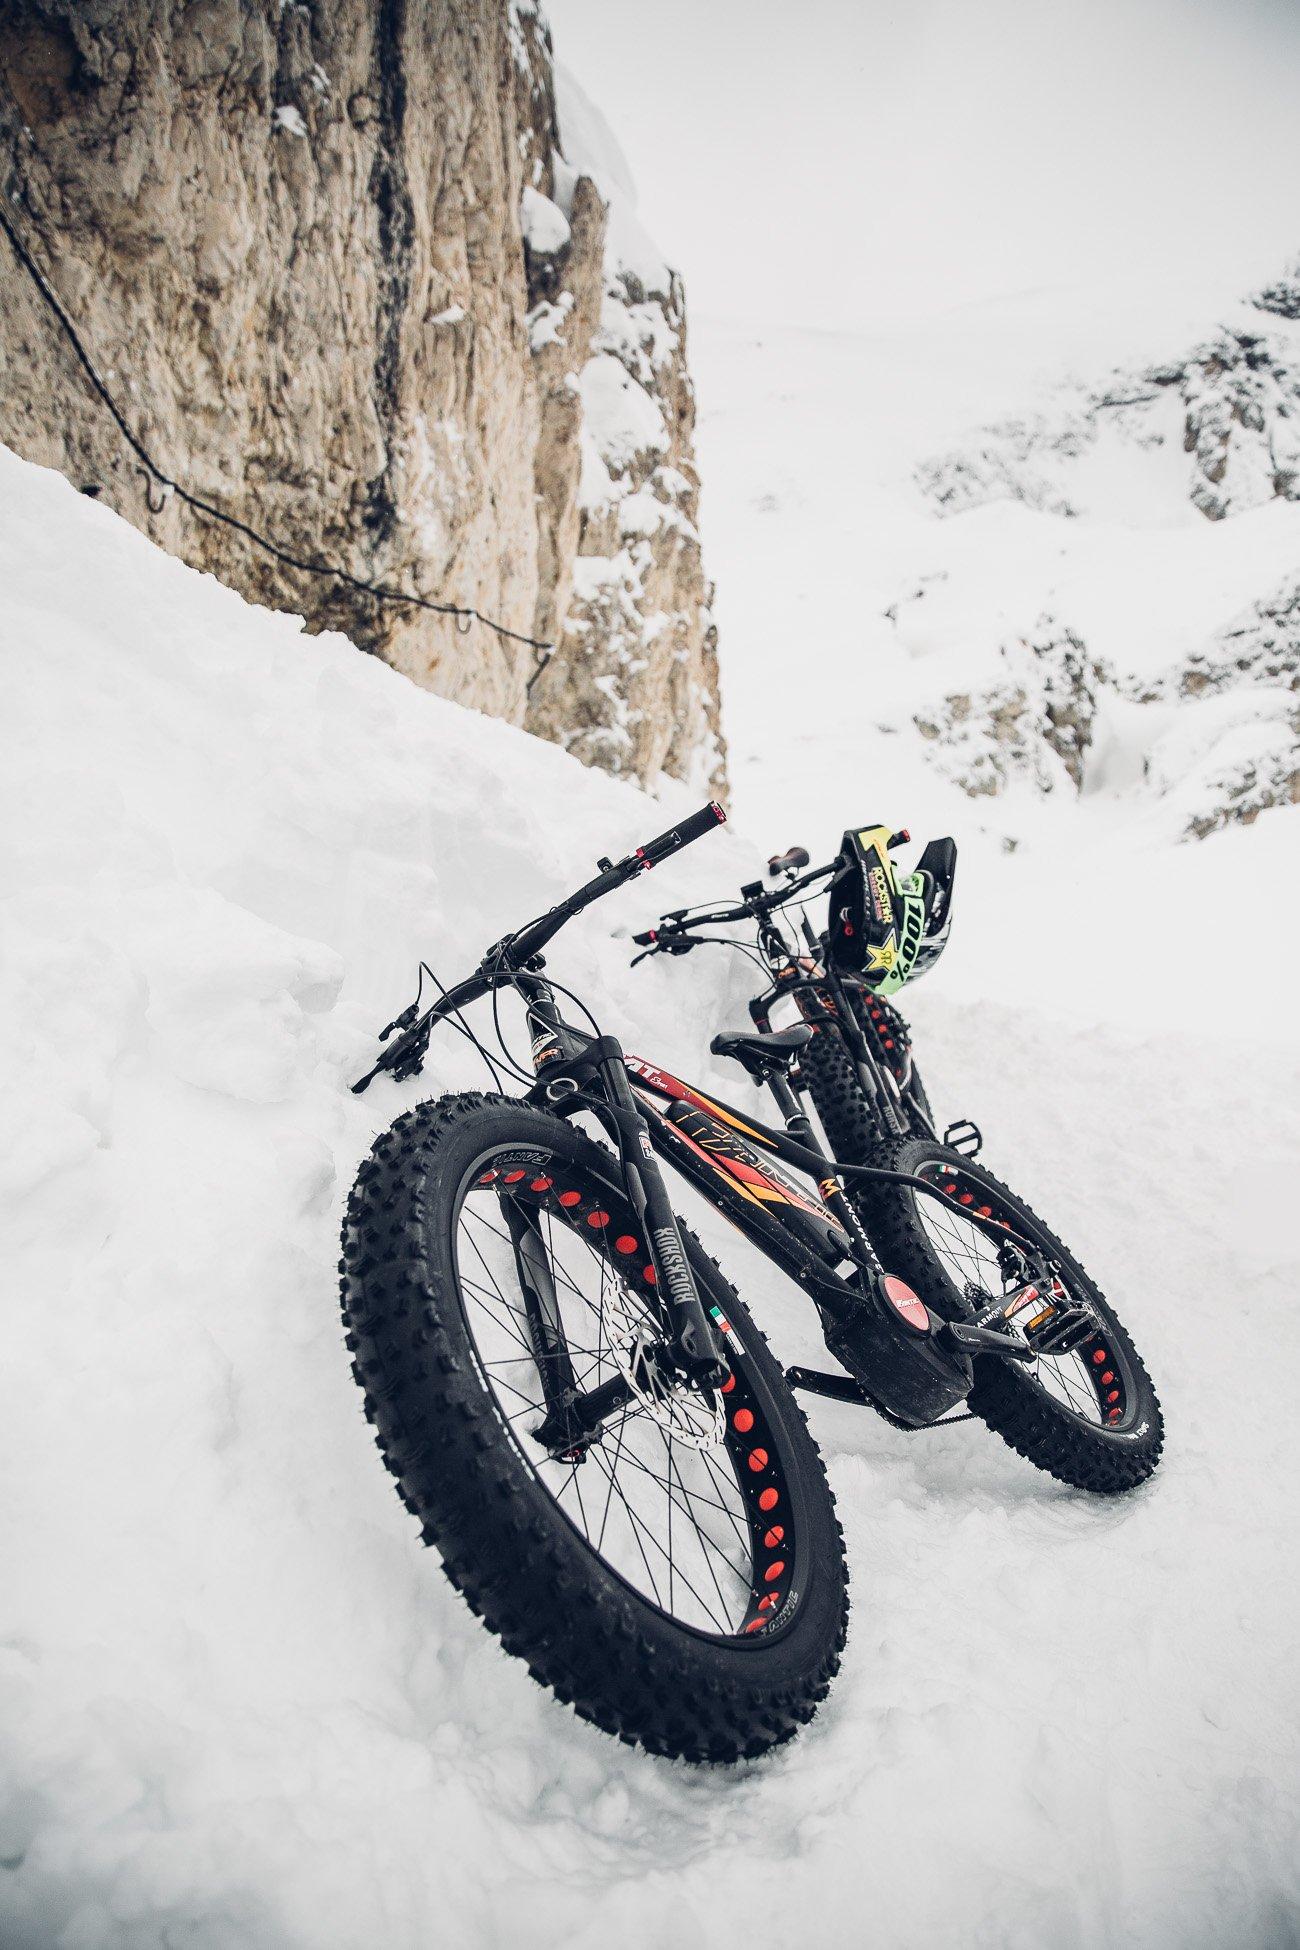 Fatbiking in Cortina d'Ampezzo